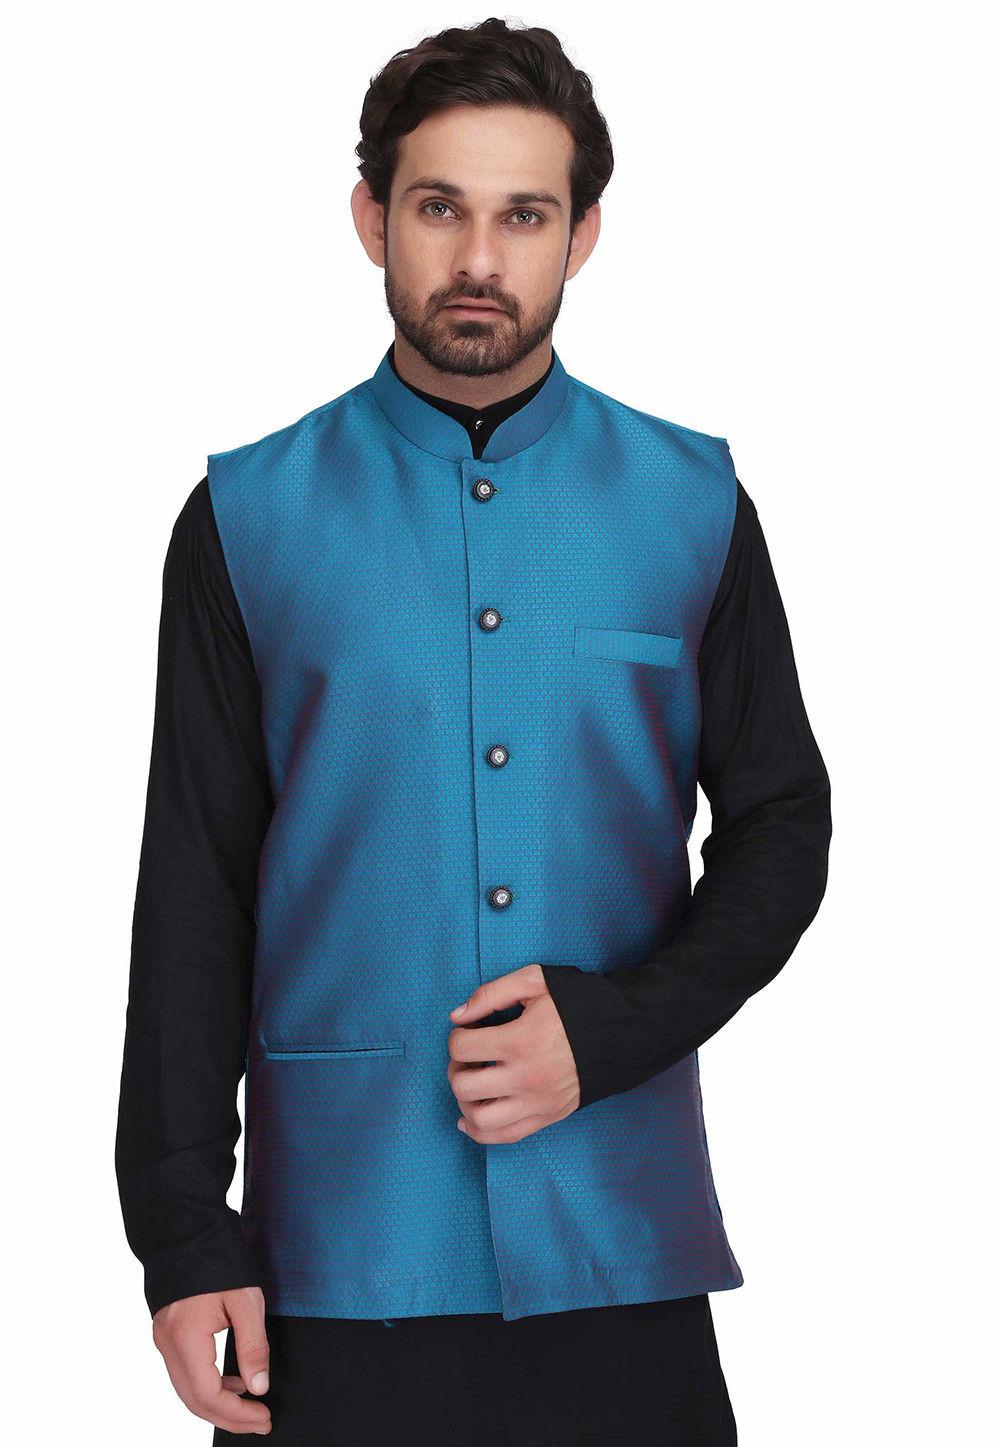 Woven Art Silk Jacquard Nehru Jacket in Teal Blue